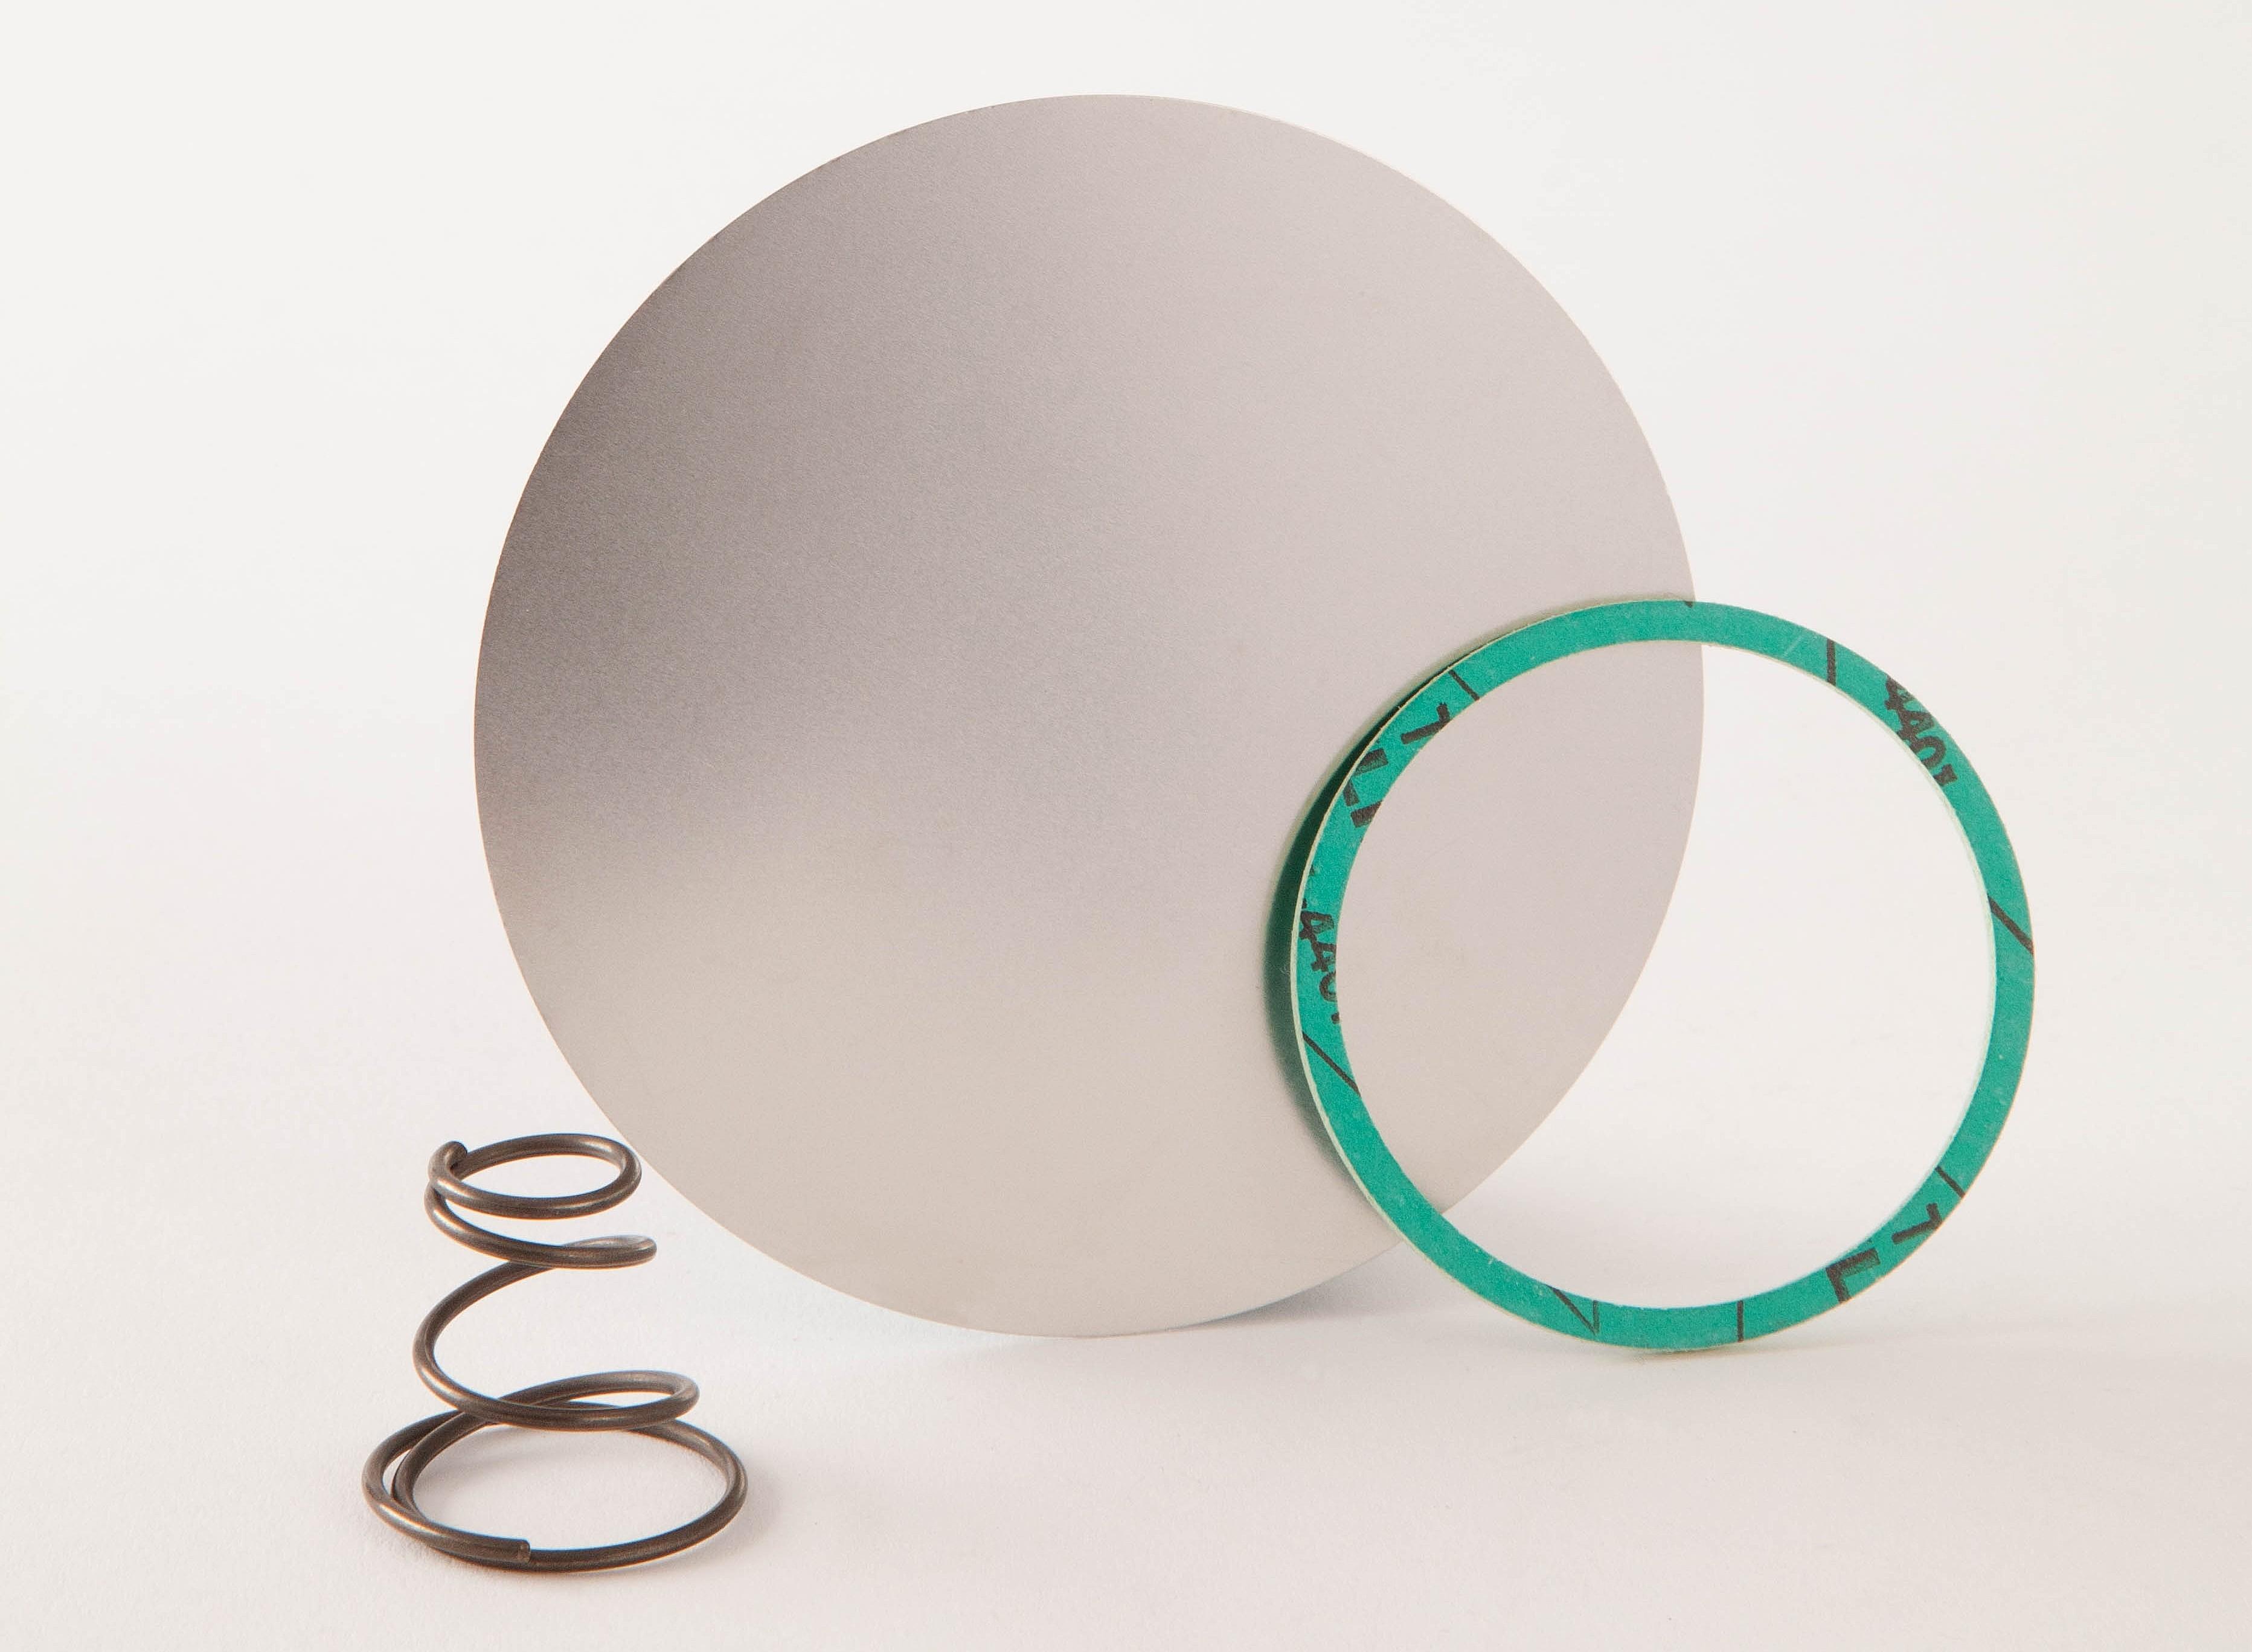 1094 sound unit repair kit air horns by grover products Air Horn Diaphragm Design